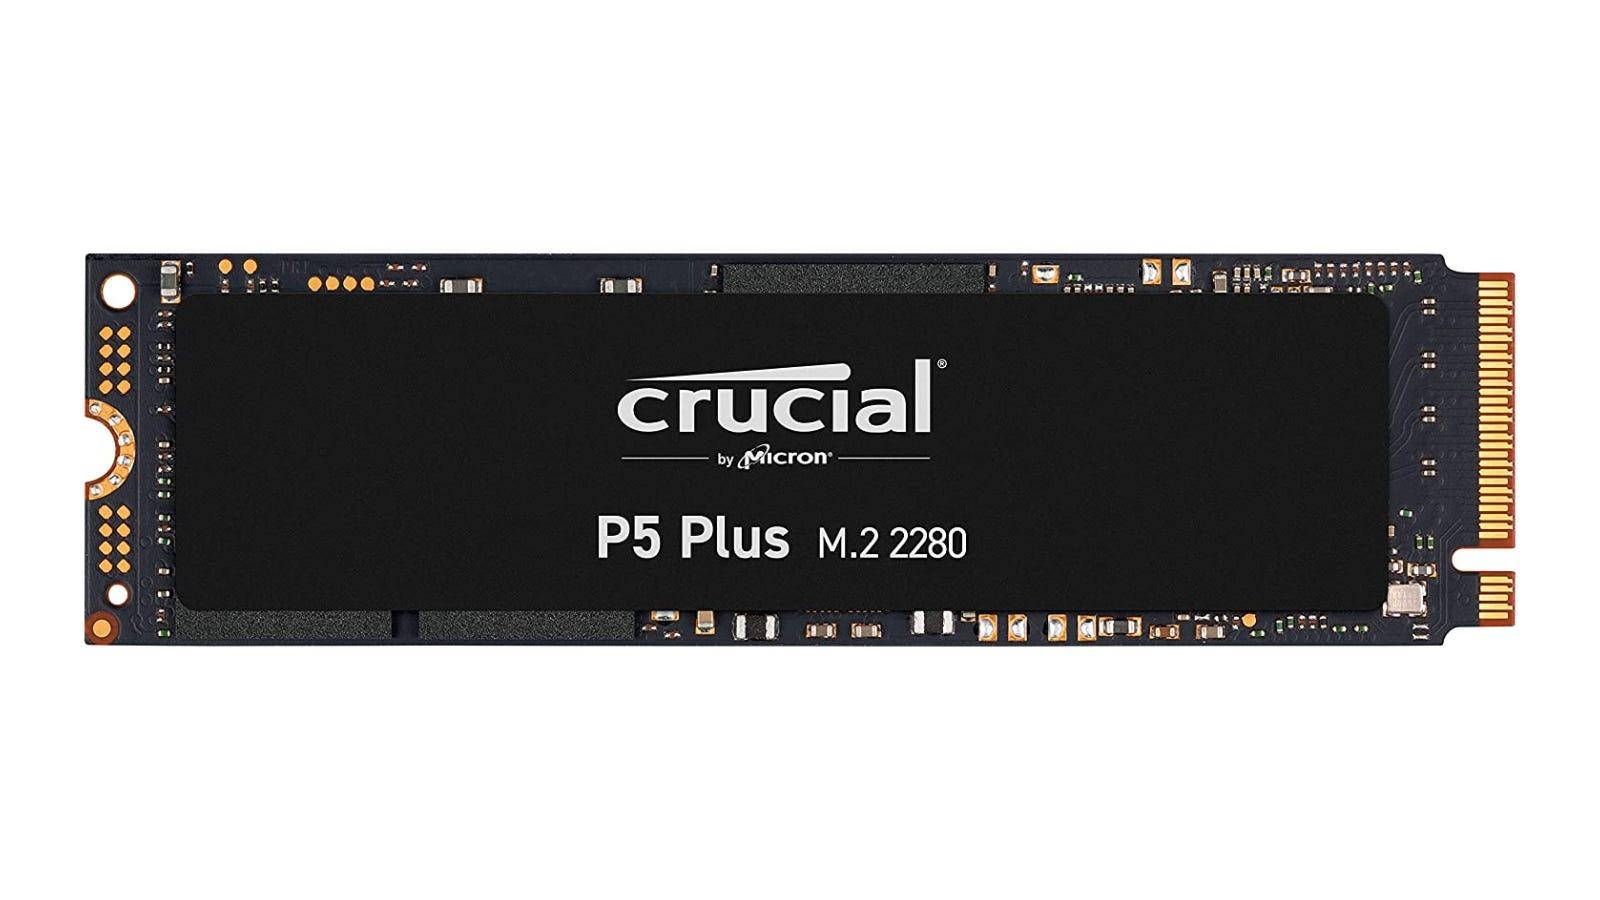 Crucial P5 Plus SSD